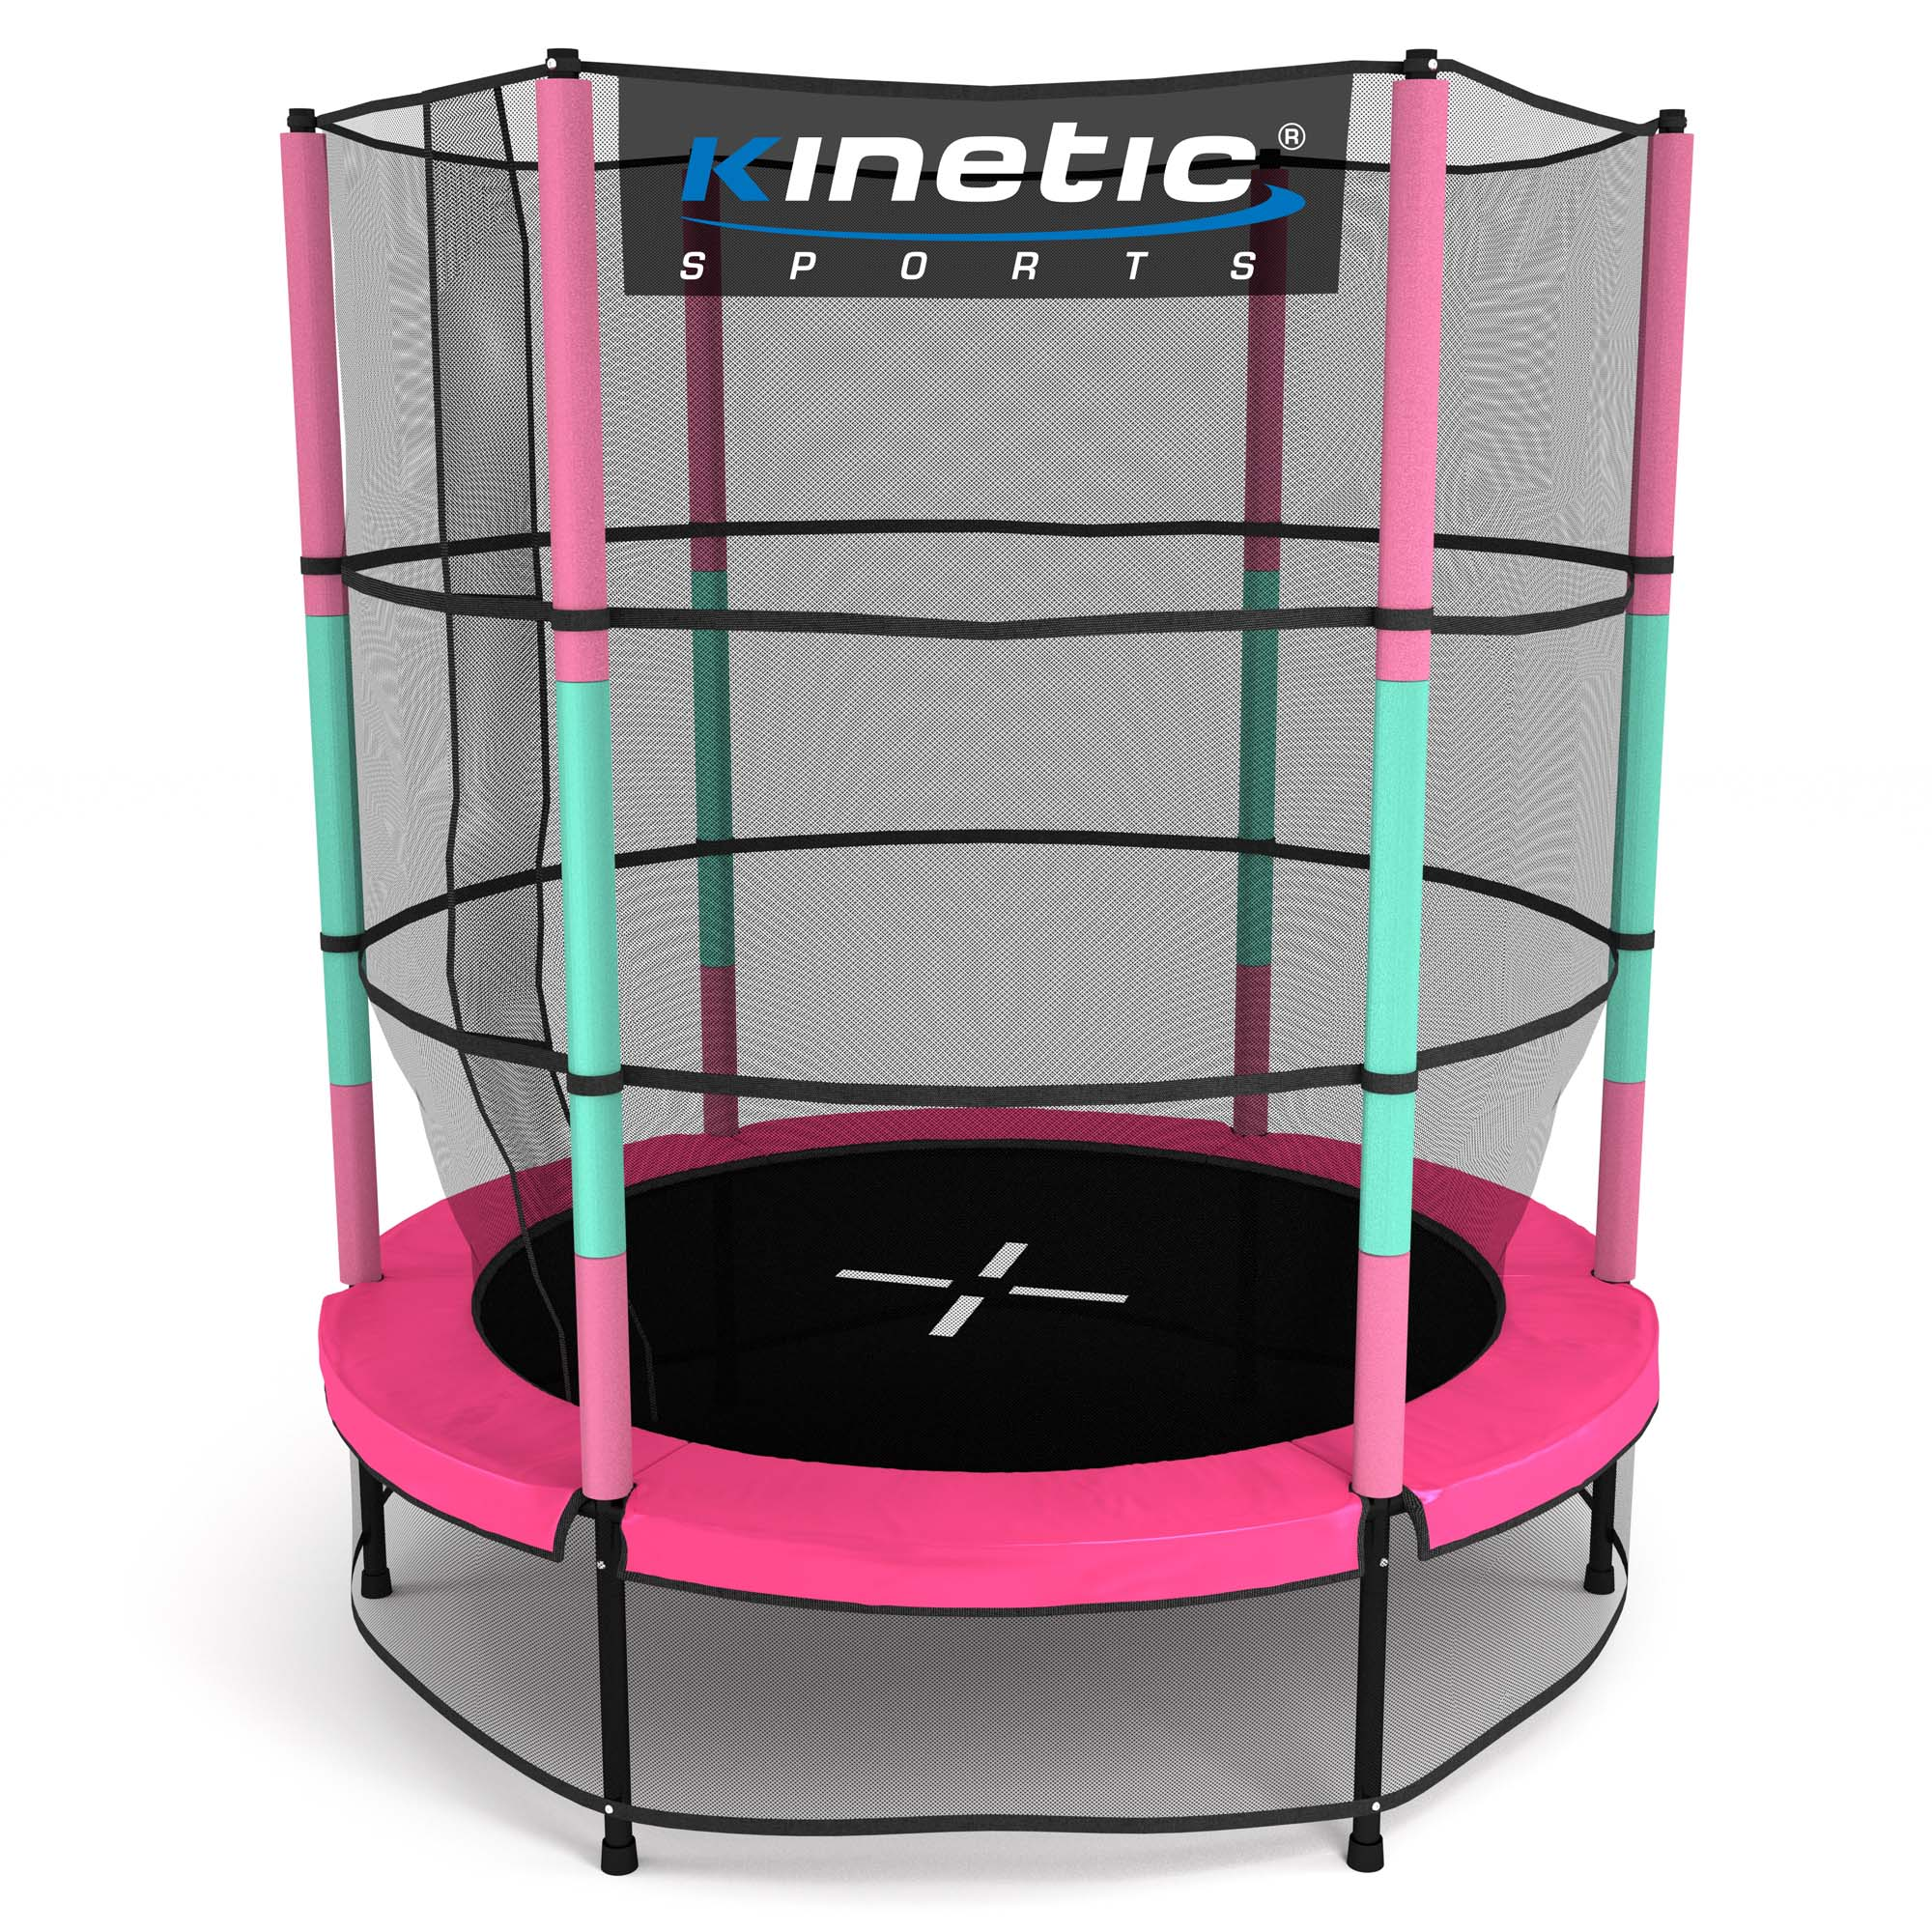 kinder trampolin indoor outdoor garten 140cm mit. Black Bedroom Furniture Sets. Home Design Ideas